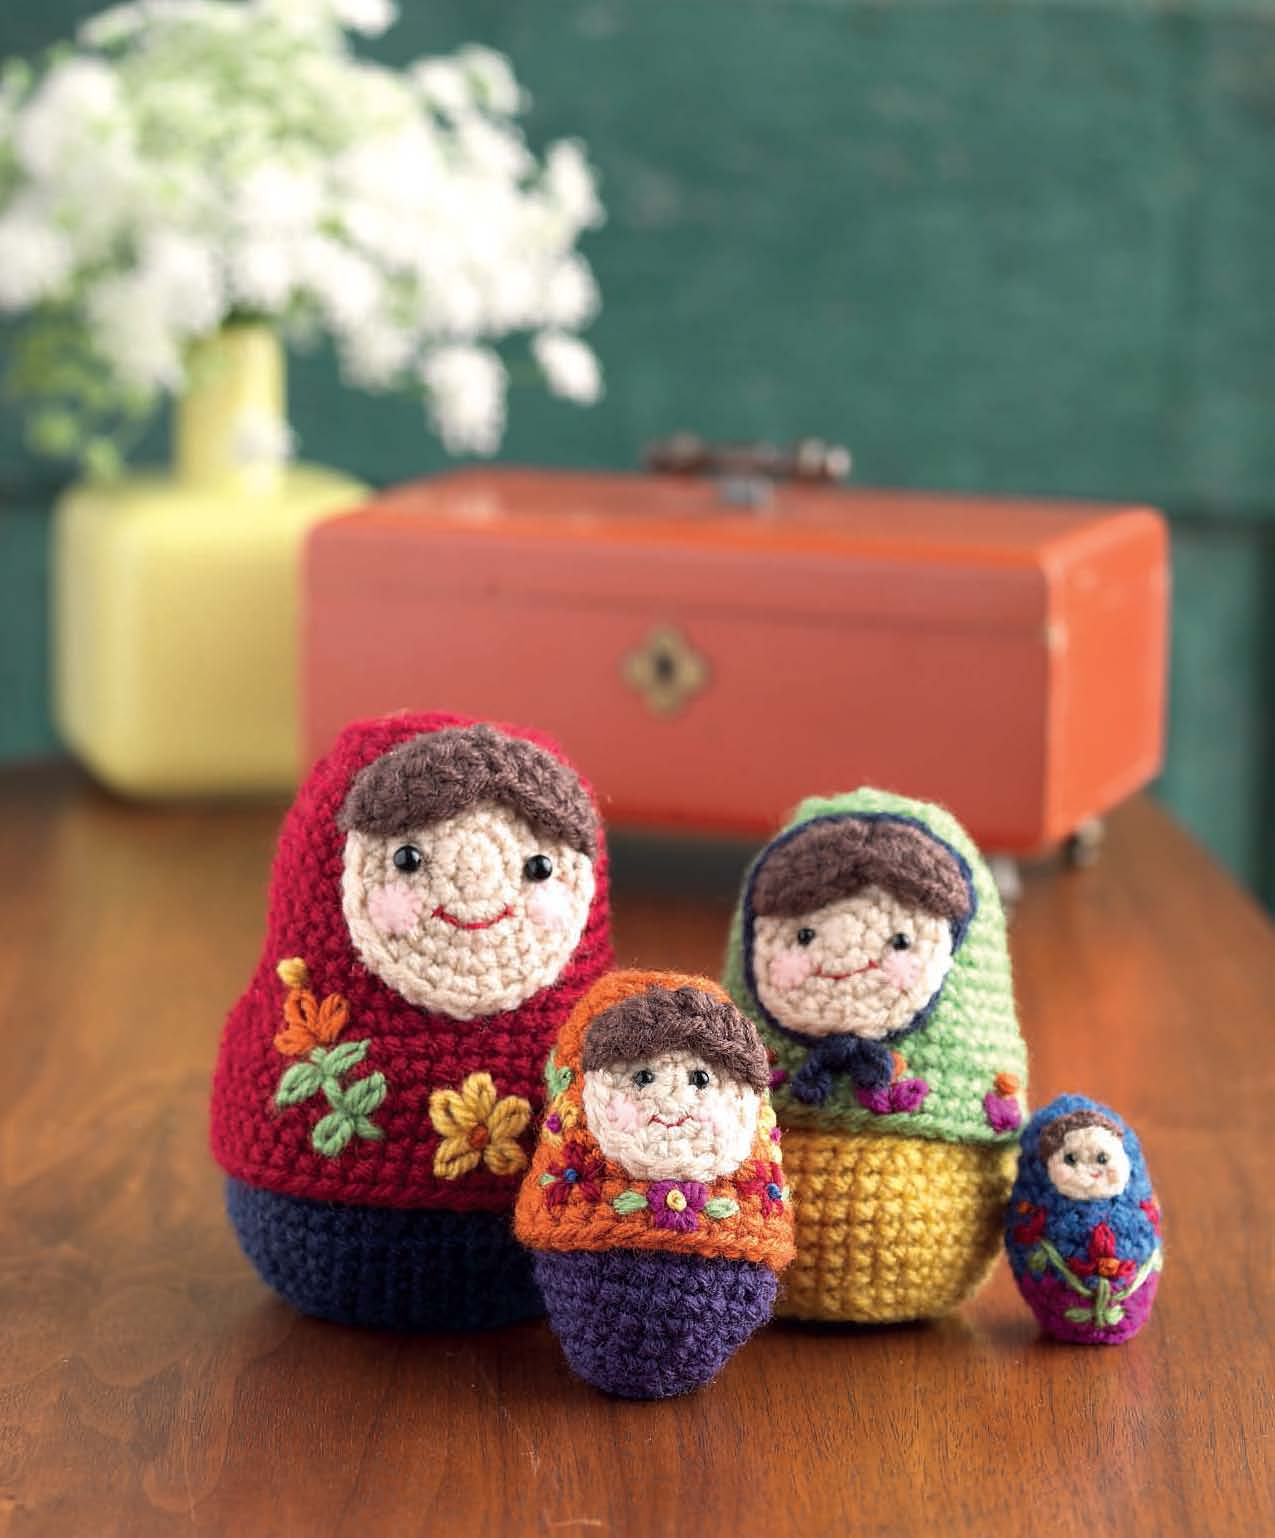 Free Pattern: Crochet Nesting Dolls! Get a Fun Matryoshka Pattern By Amy Gaines